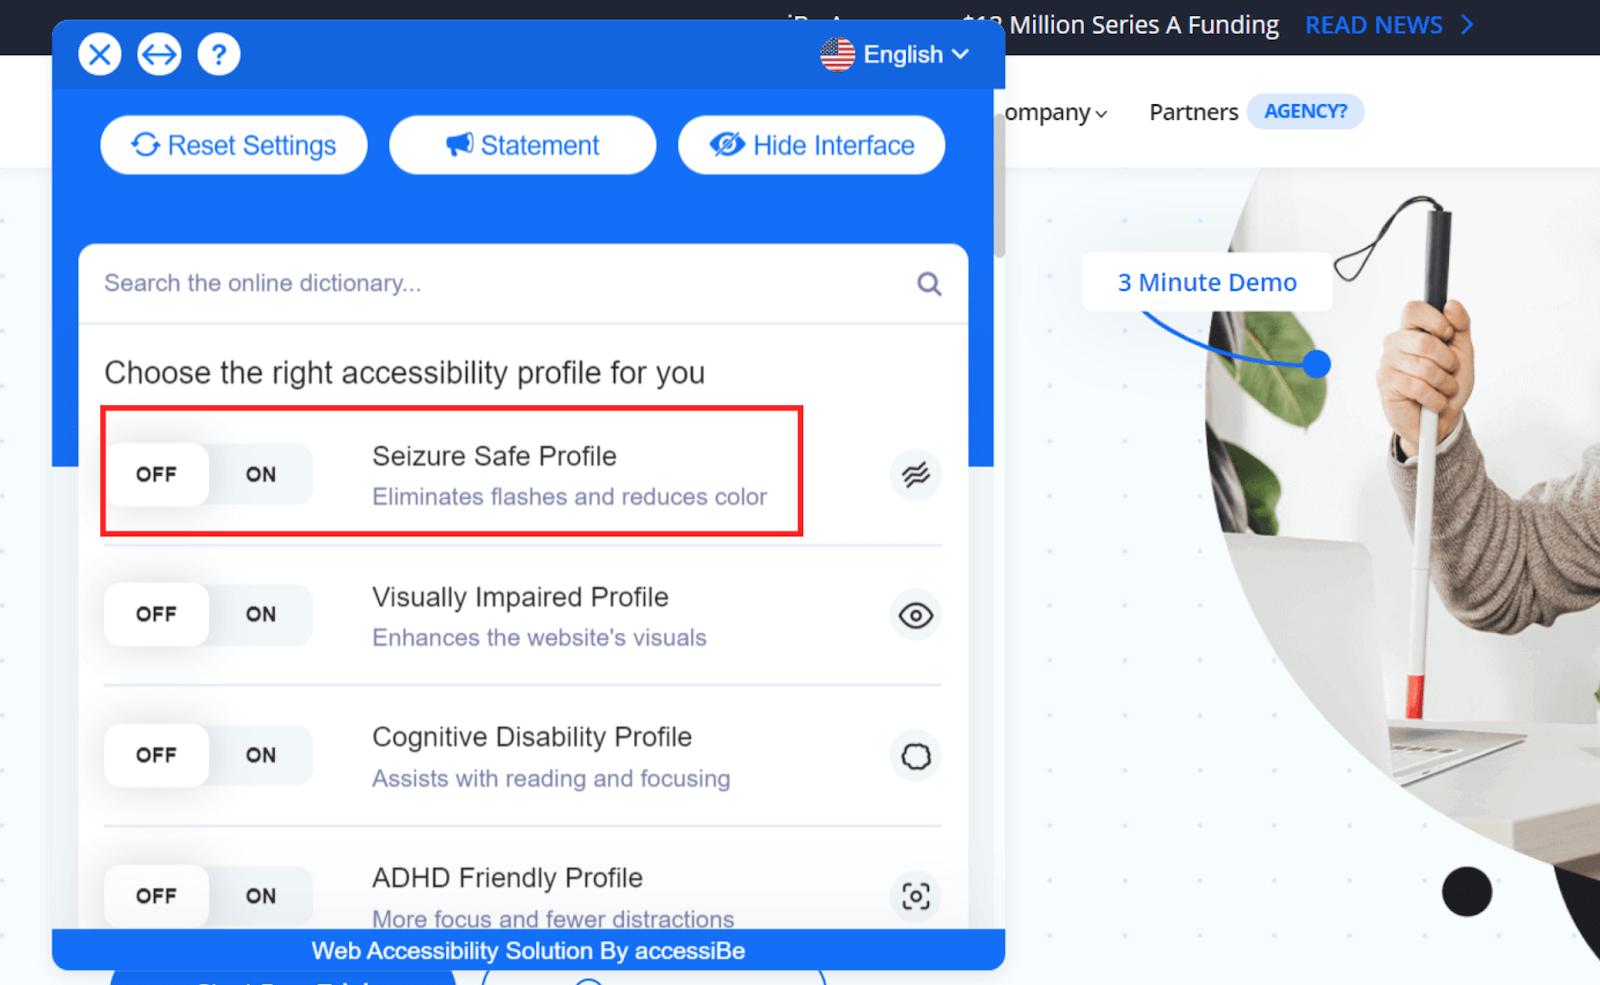 accessiBe Profiles